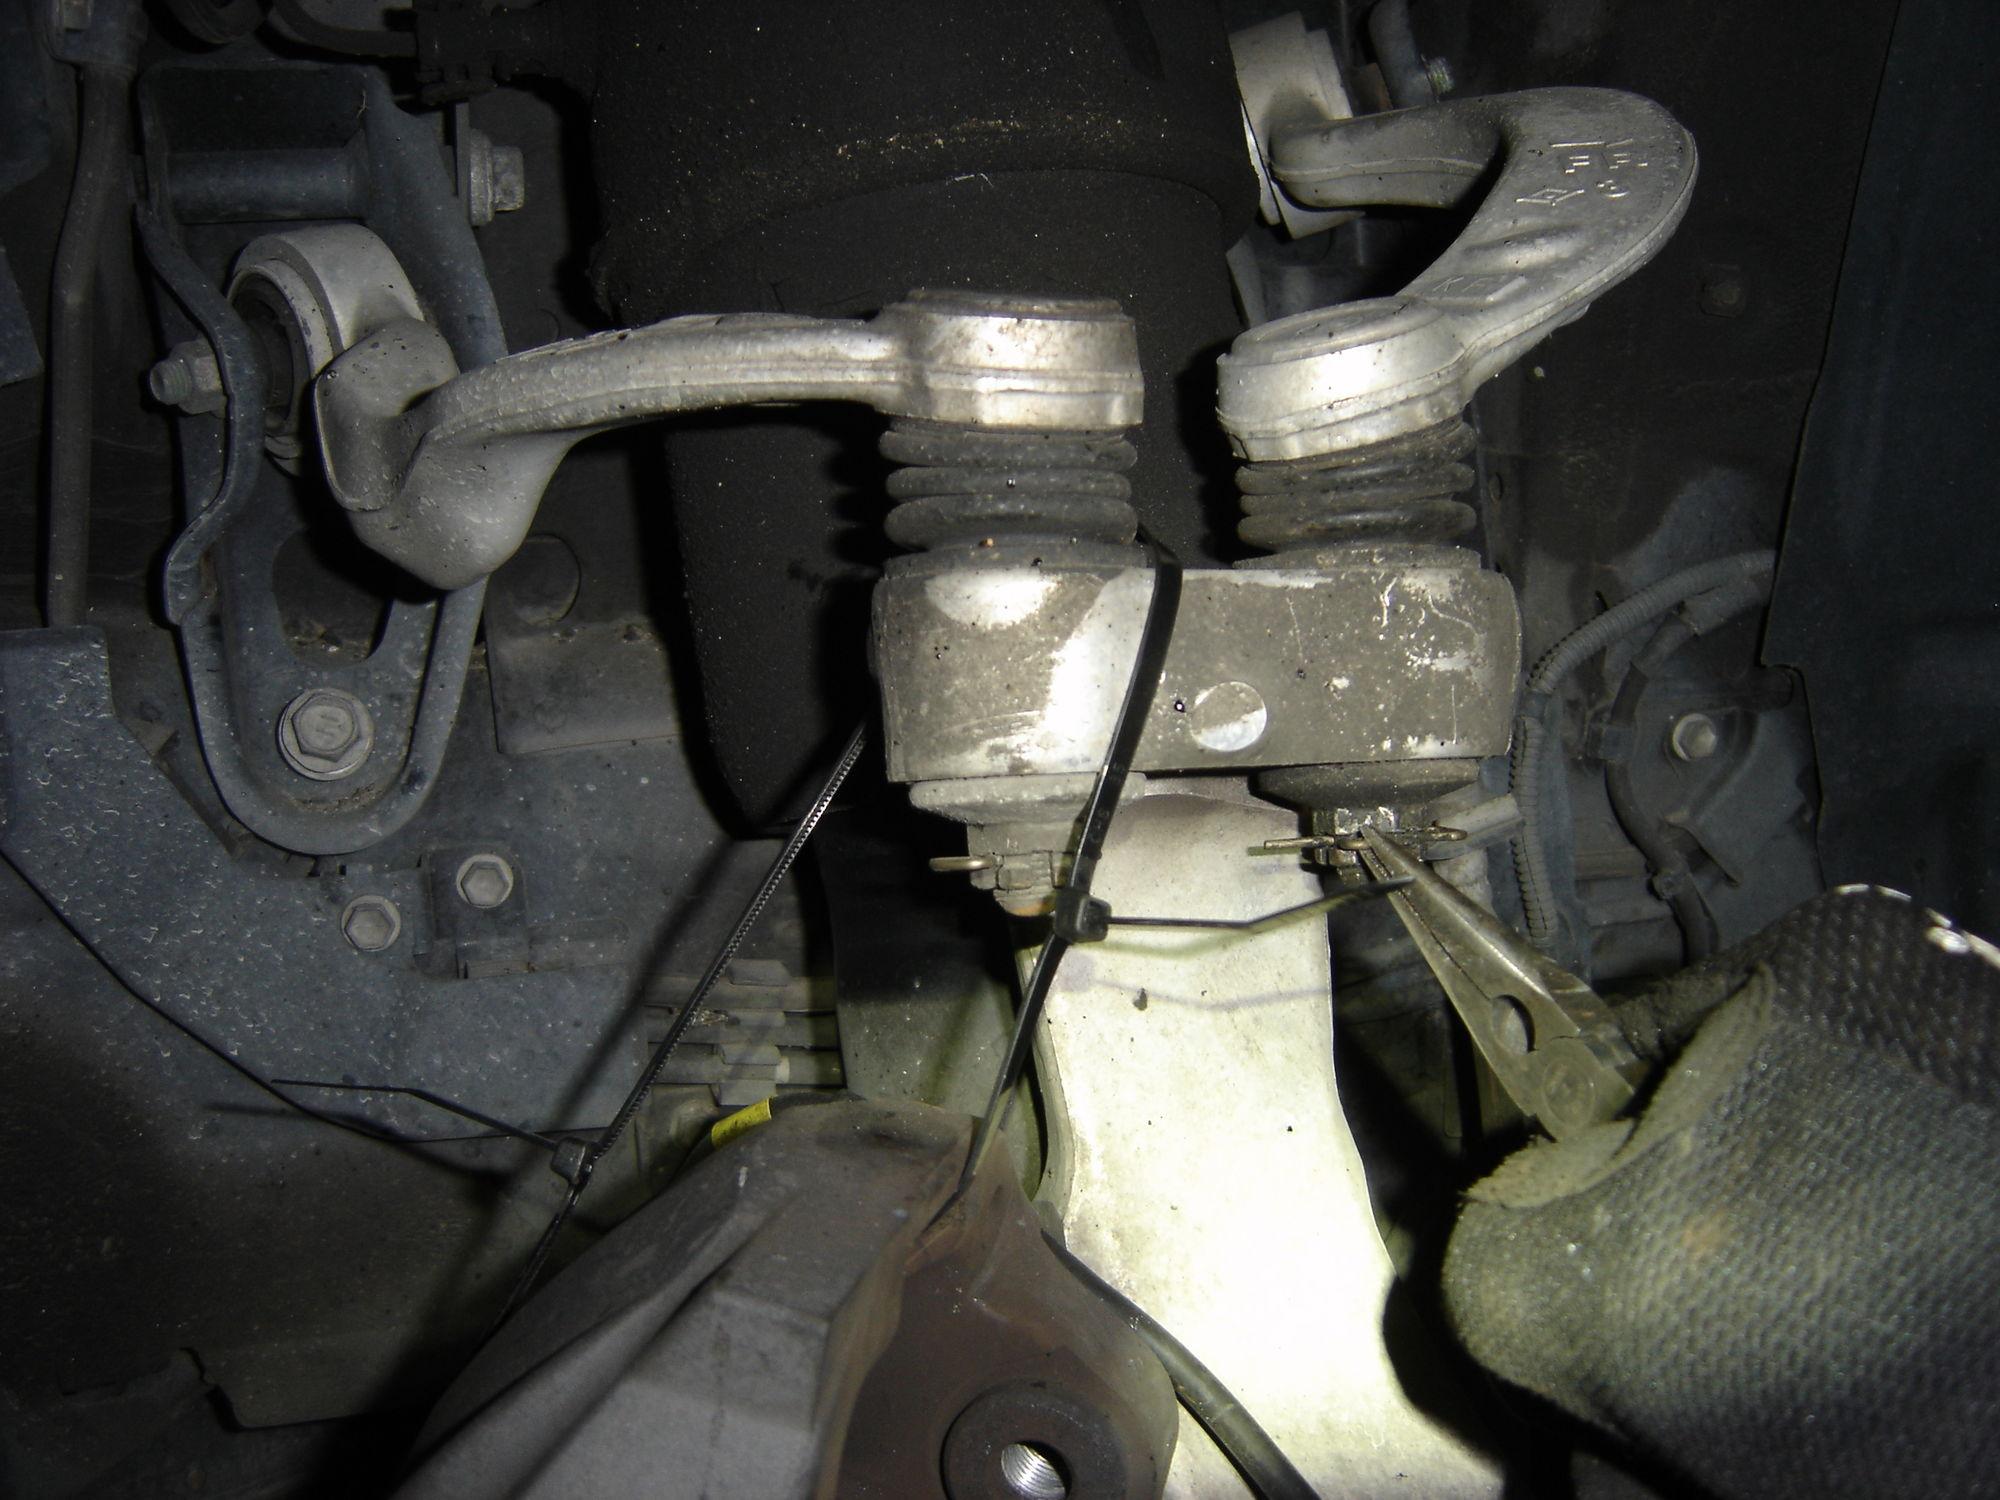 2008 Ls460l Upper Control Arm Bushing Repair A Step By